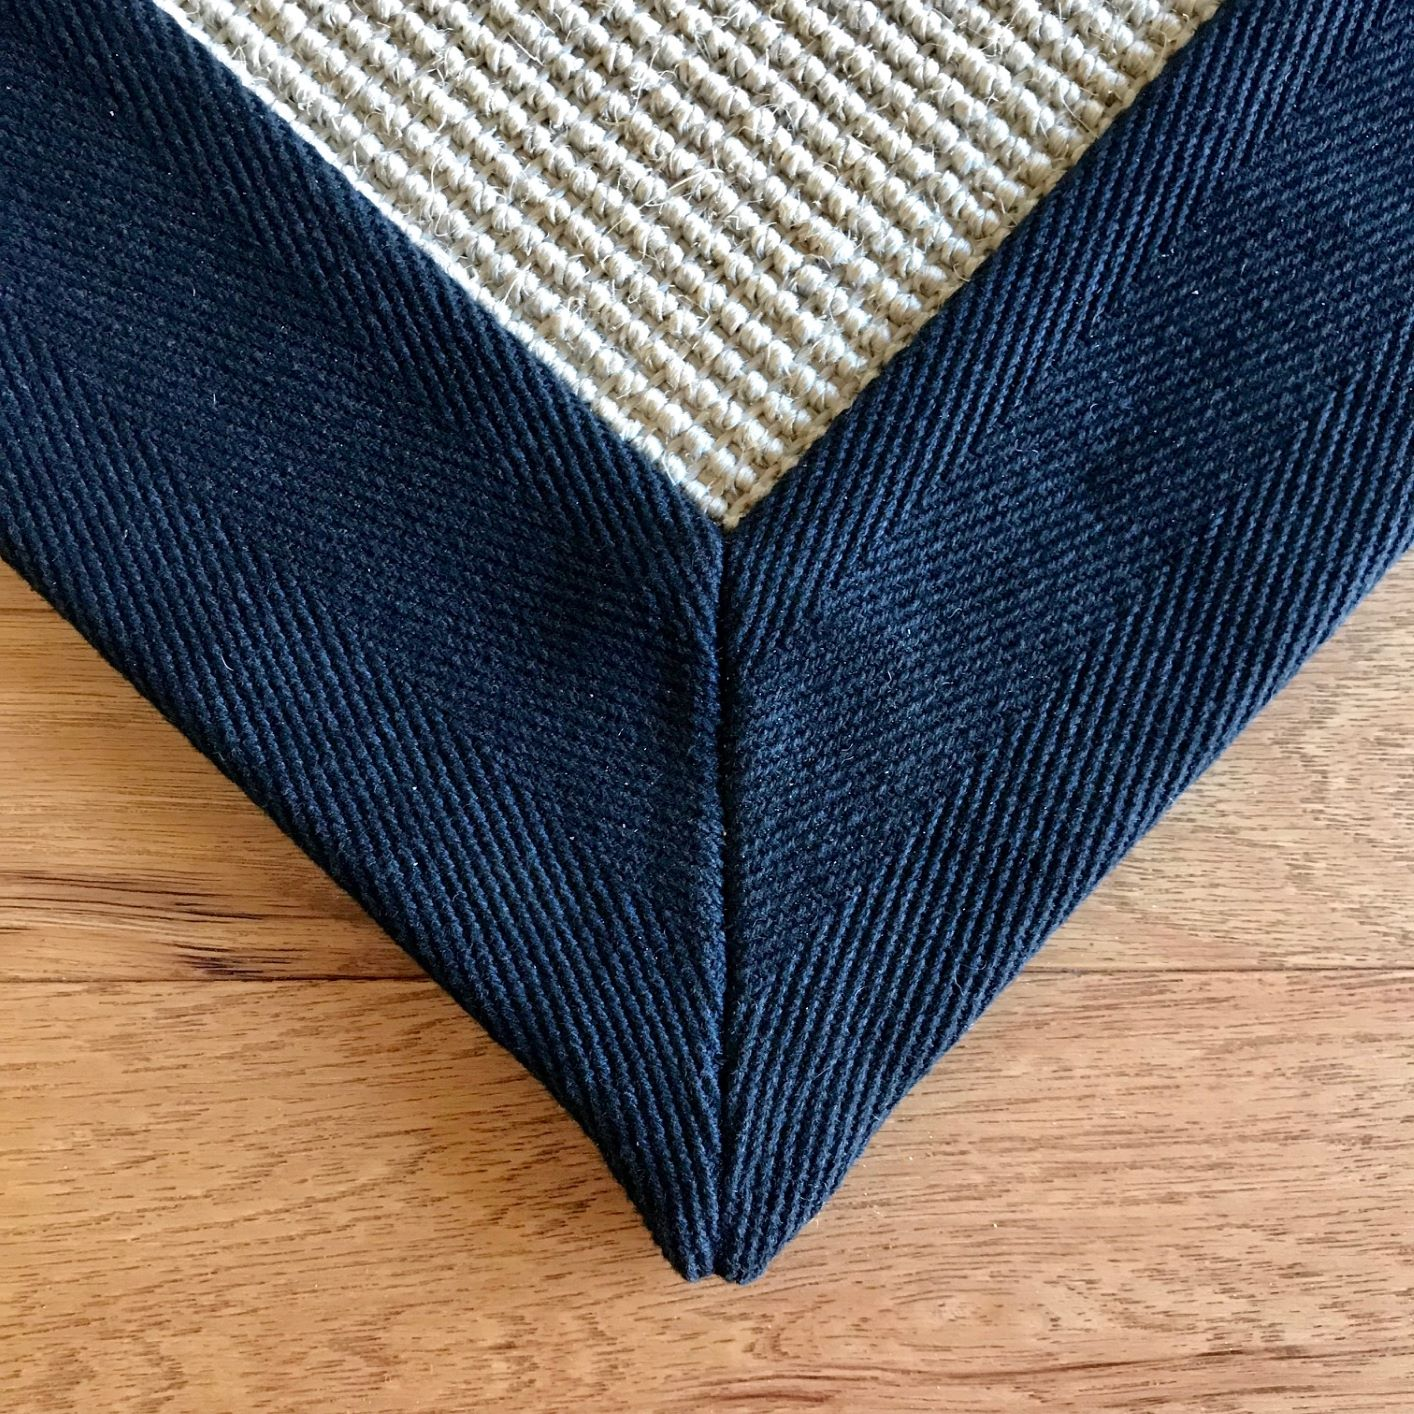 fabric bind - mitered.jpg